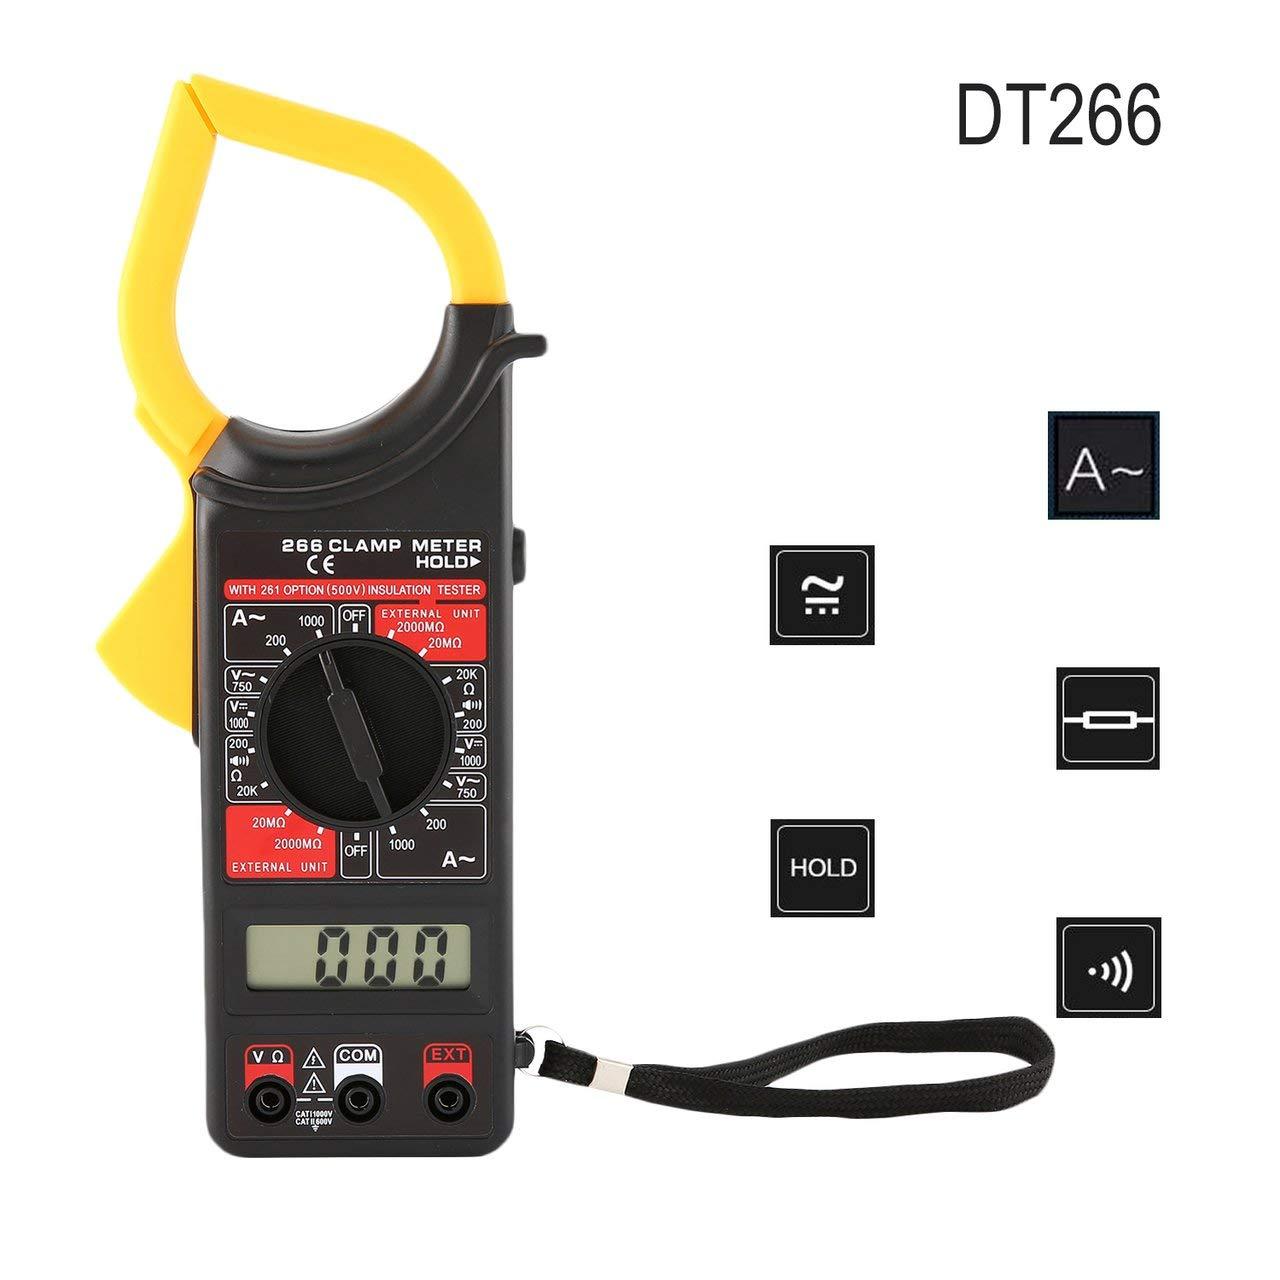 Jasnyfall DT266 Handheld Digital Clamp Meter Multimeter AC//DC Volt Amp Ohm Tester Gelb /& Schwarz